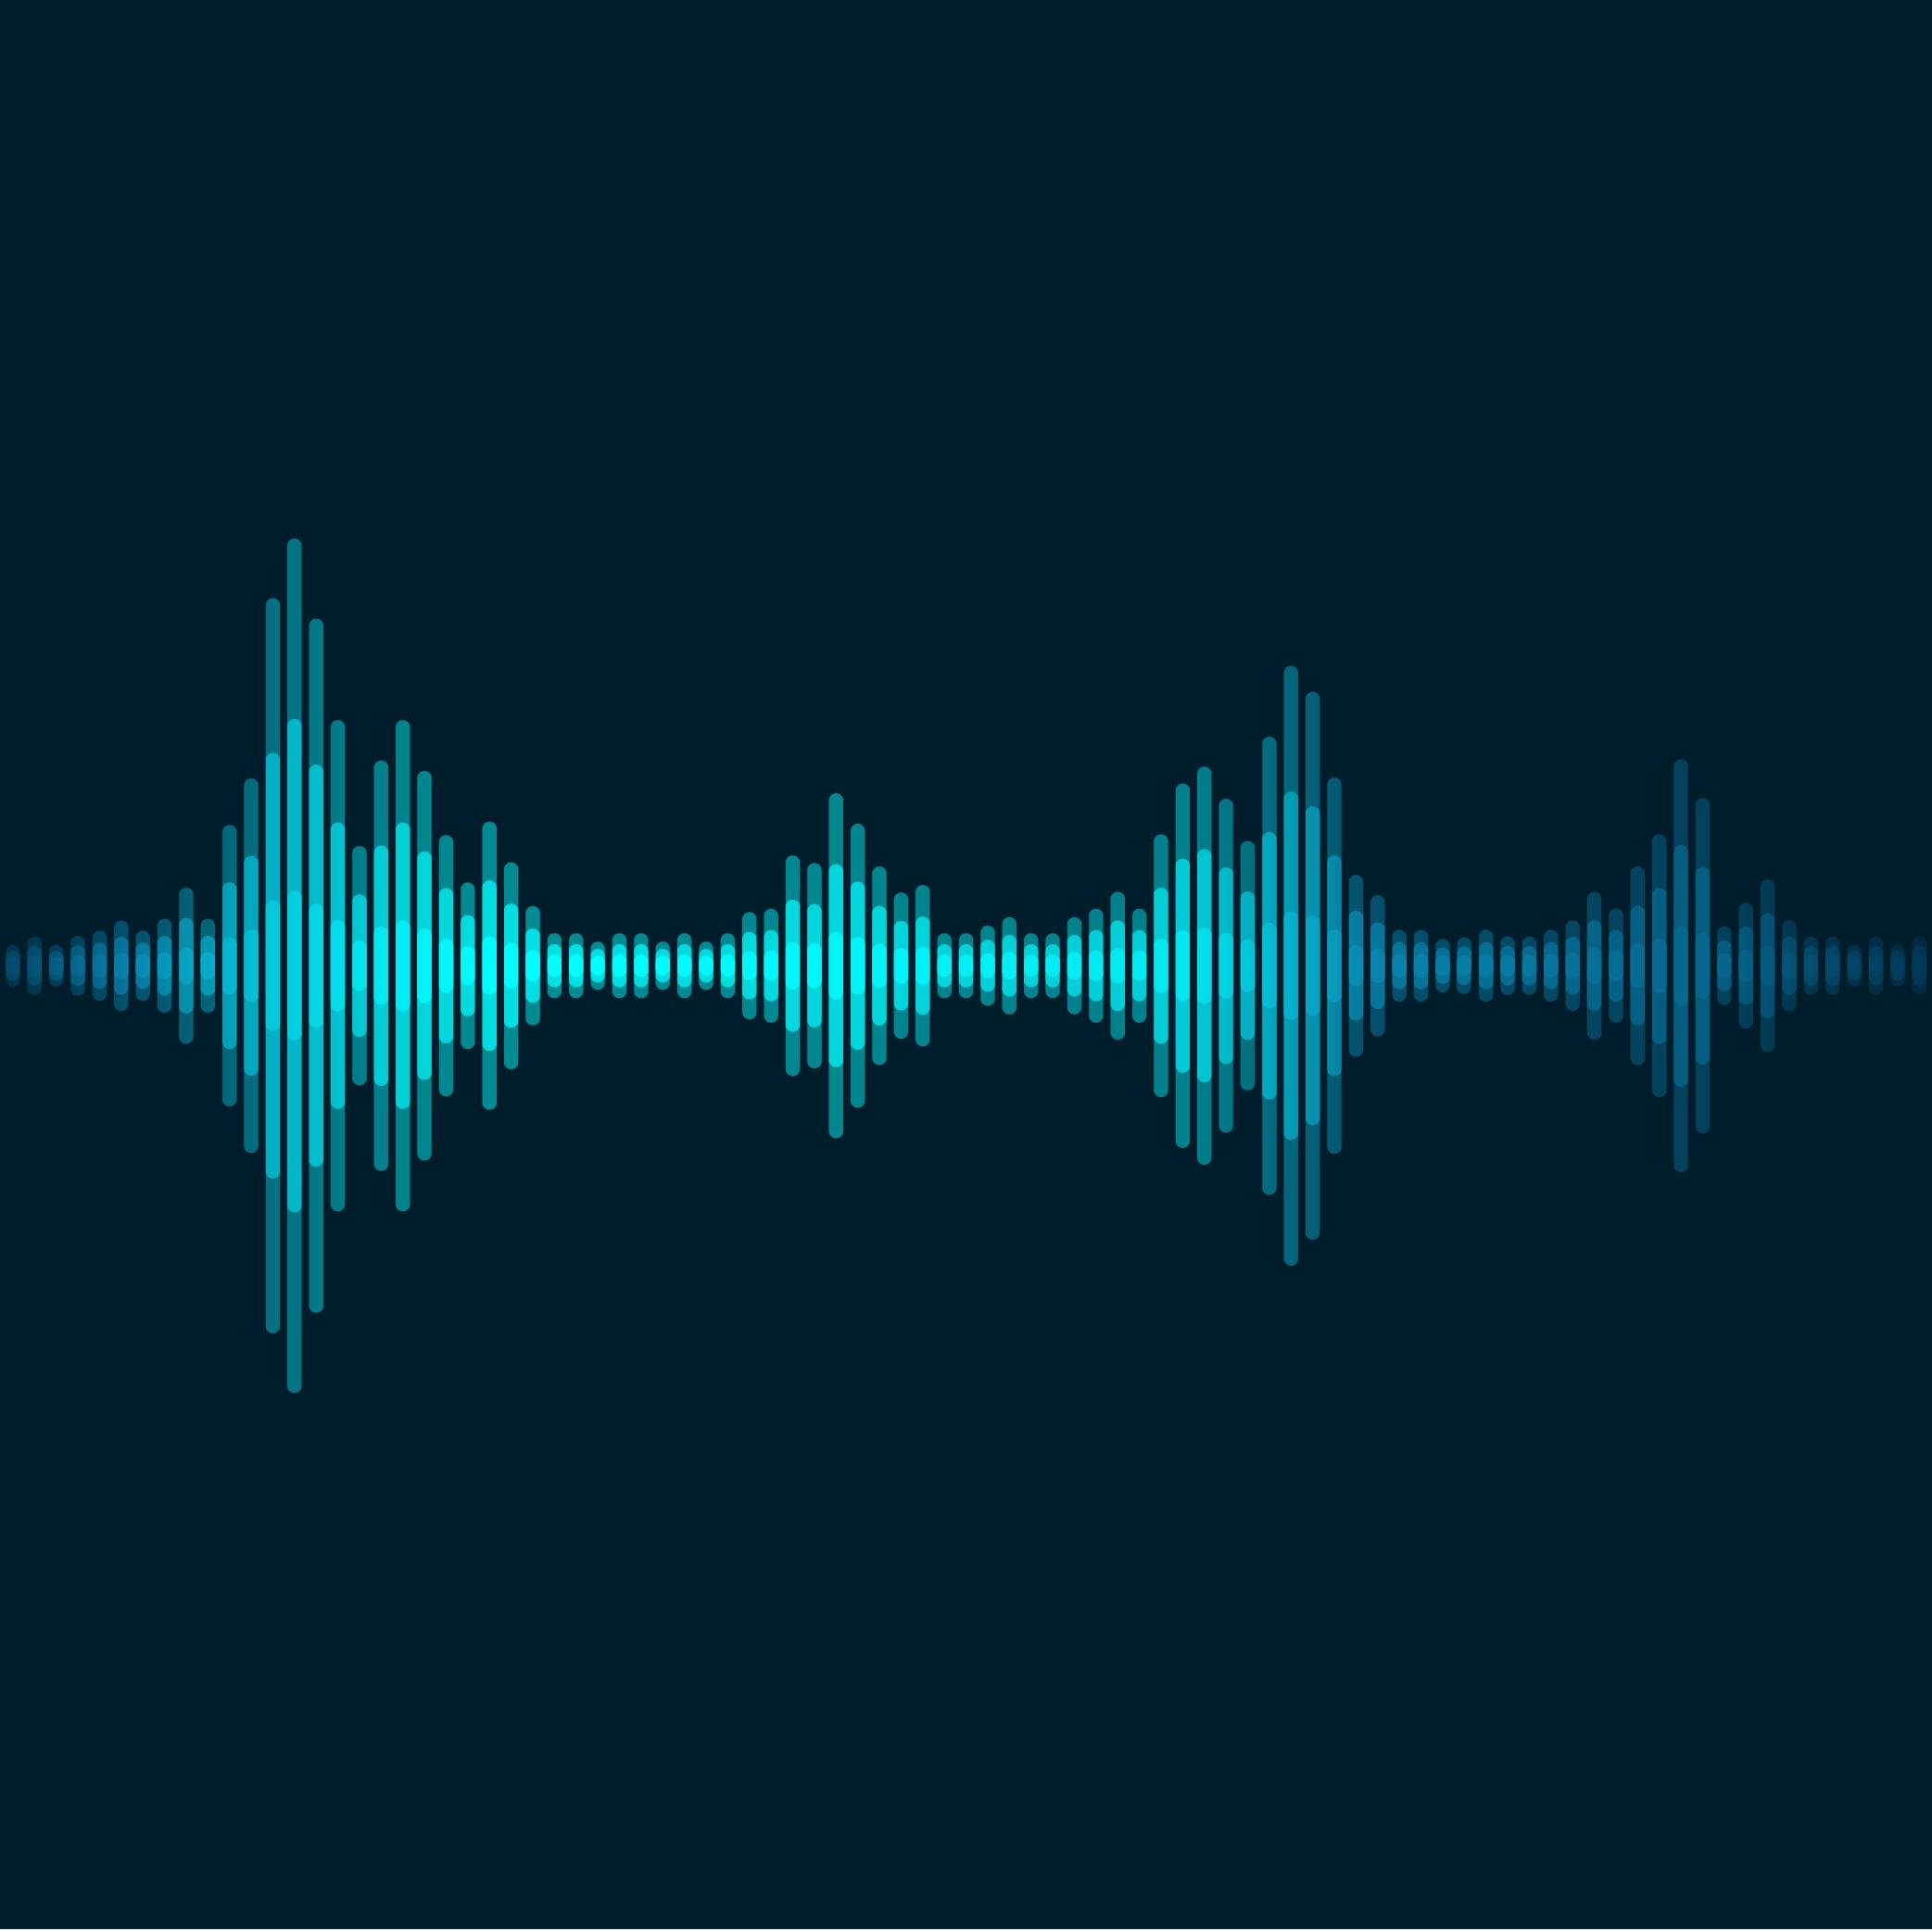 Blue sound wave on black background